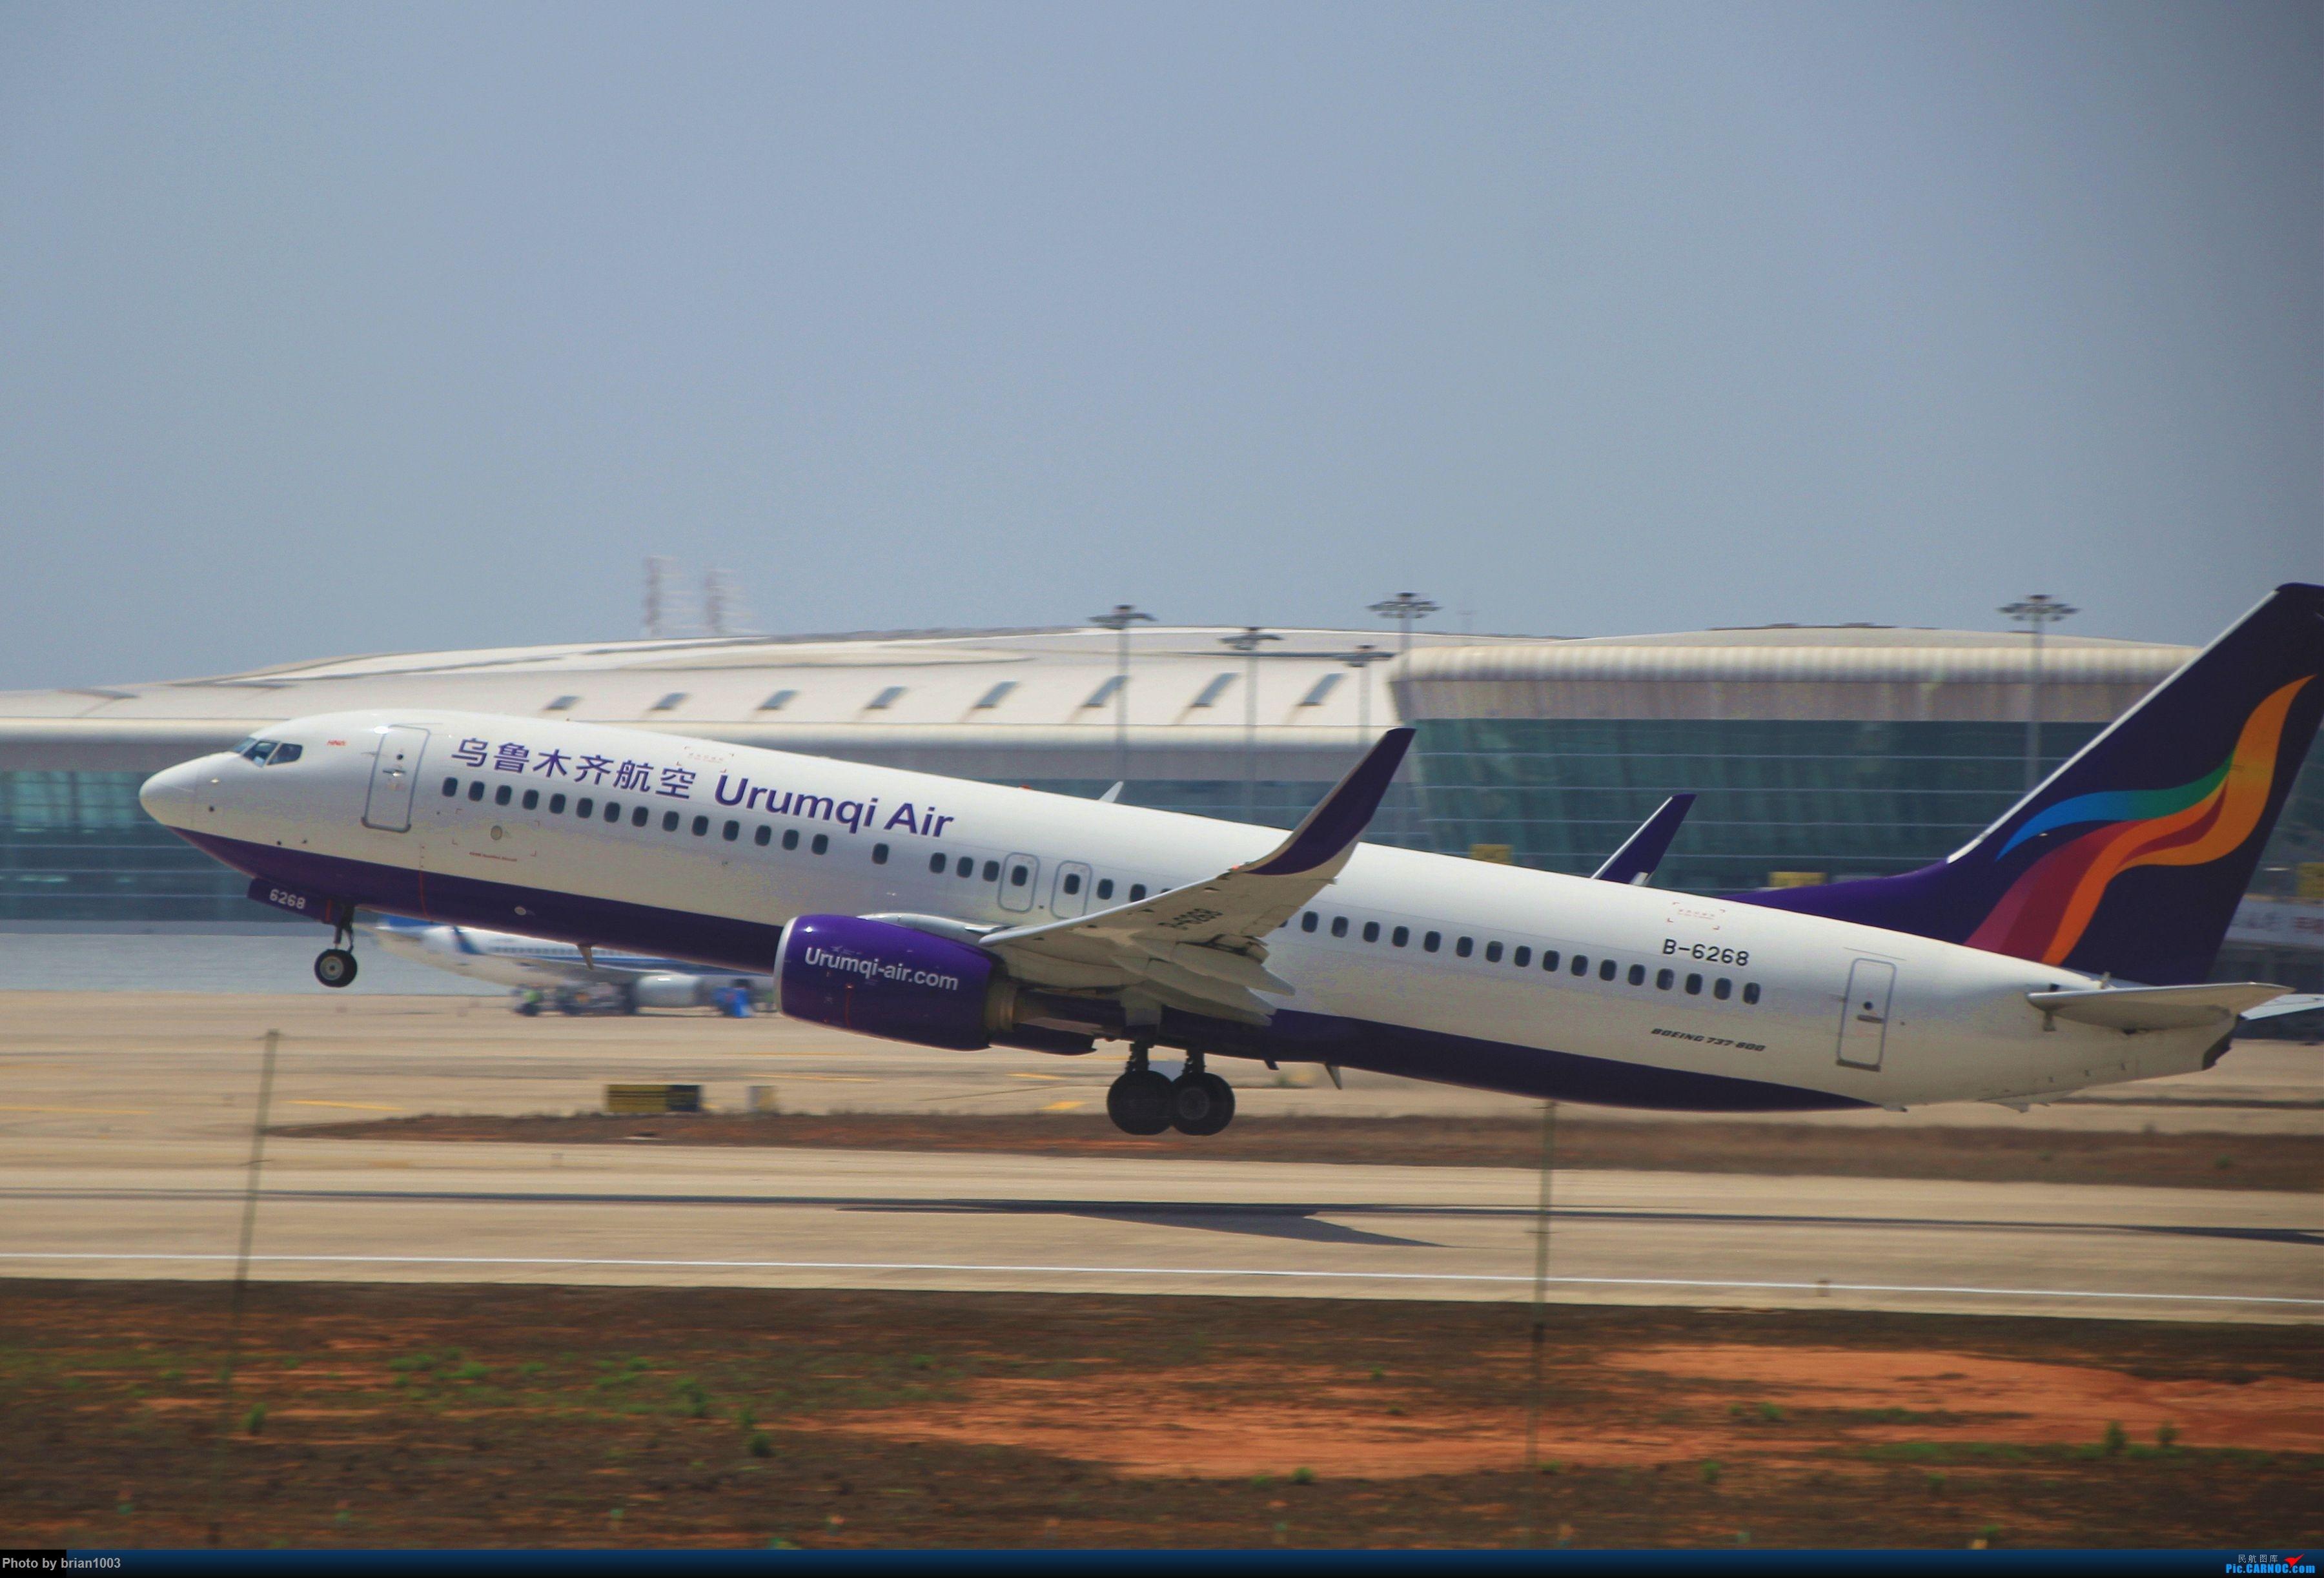 Re:[原创]WUH武汉天河机场拍机之喜迎酷航788和偶遇某其他飞机 BOEING 737-800 B-6268